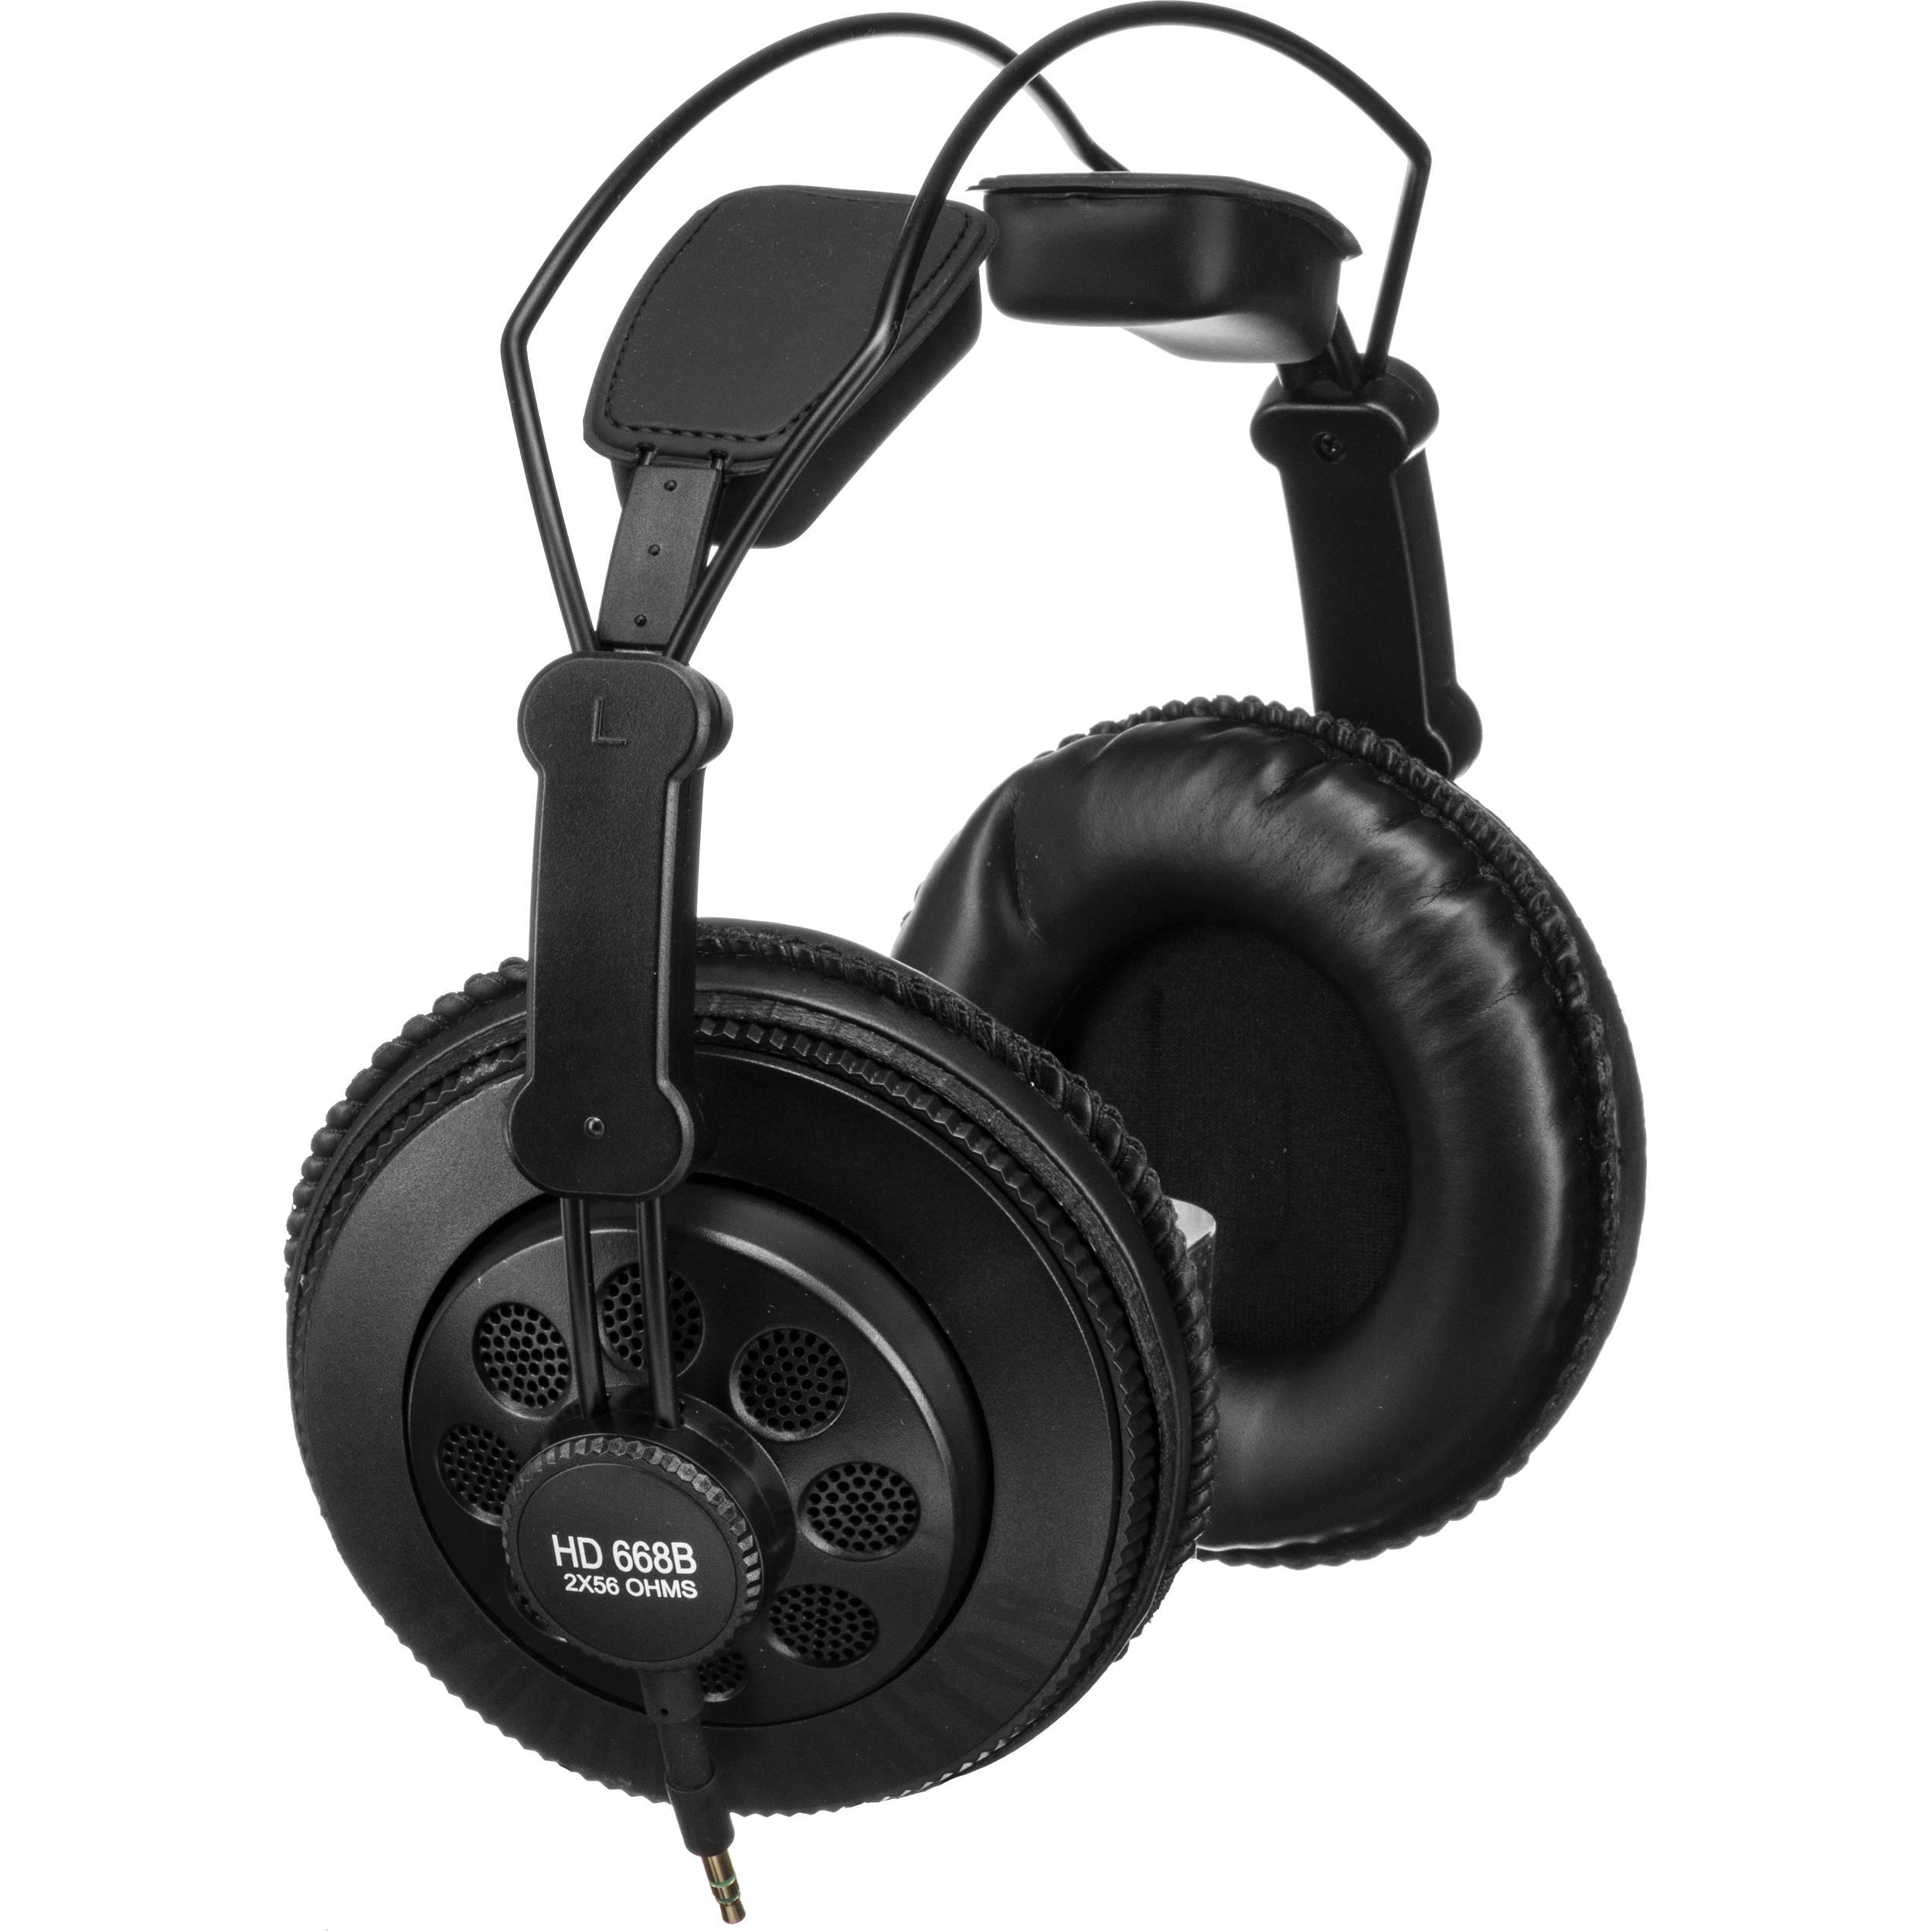 Superlux Hd 668b Professional Semi Open Studio Headphones